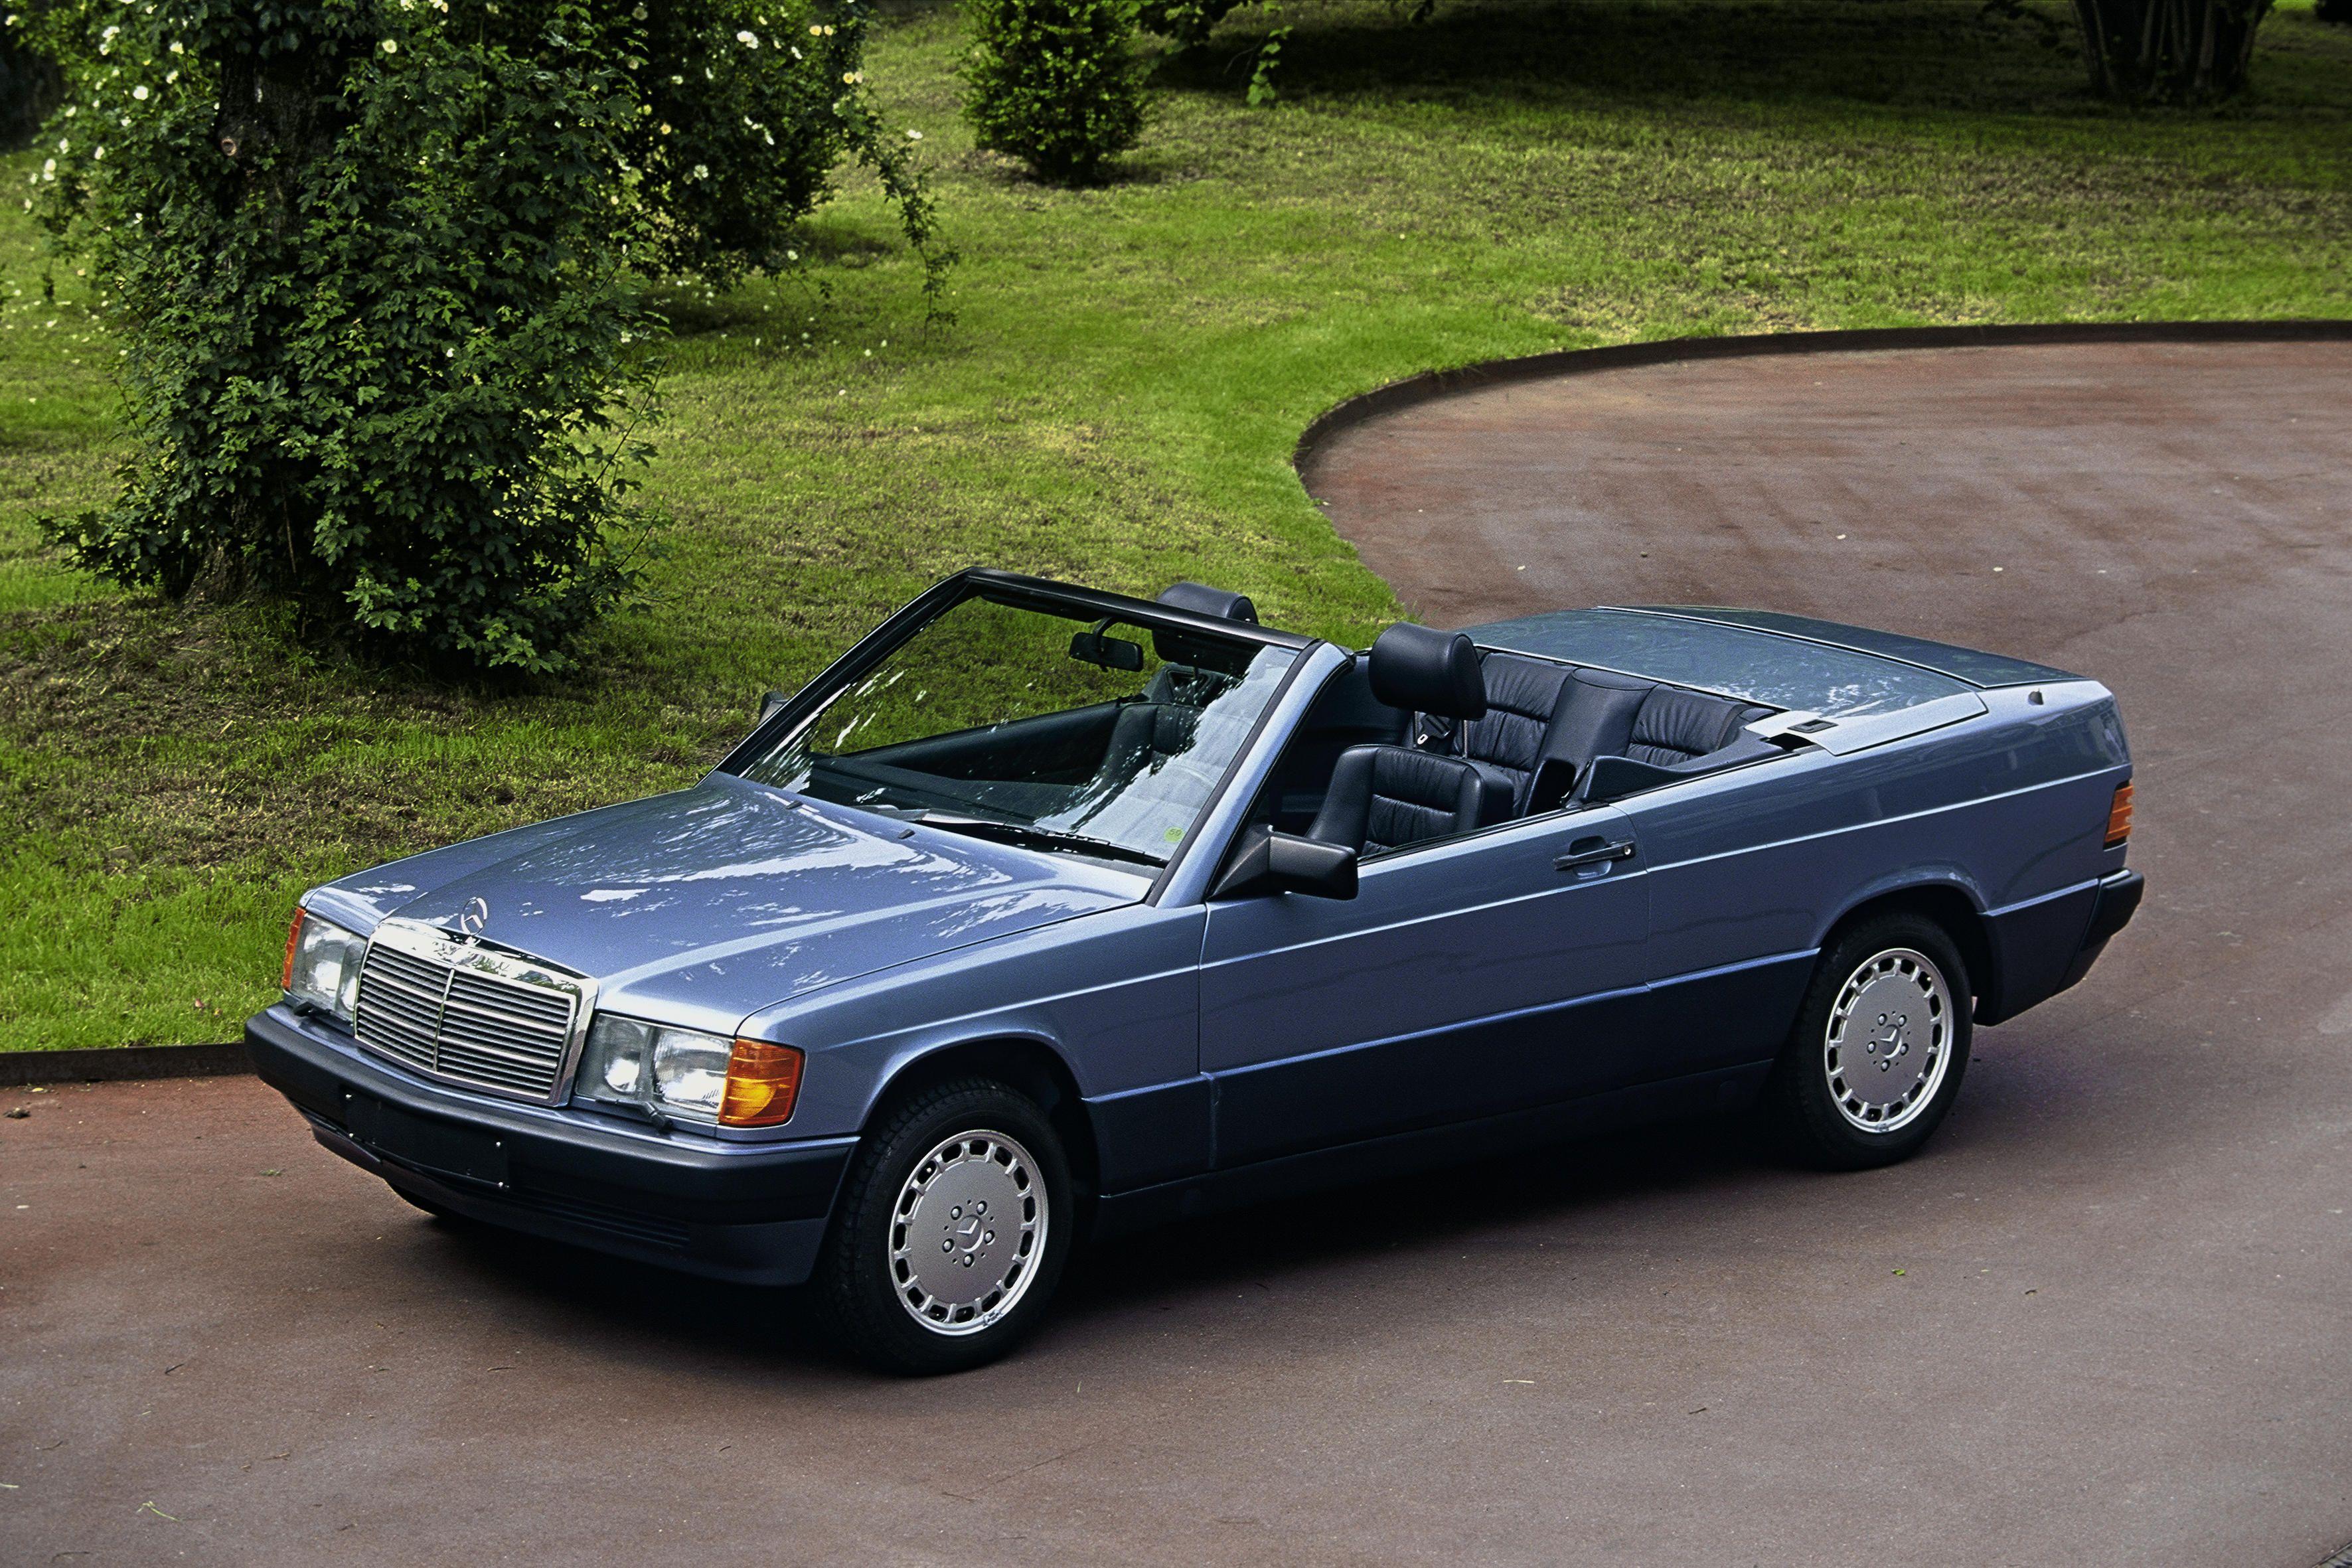 mercedes benz 190 e cabriolet prototype w201 39 1989 le. Black Bedroom Furniture Sets. Home Design Ideas